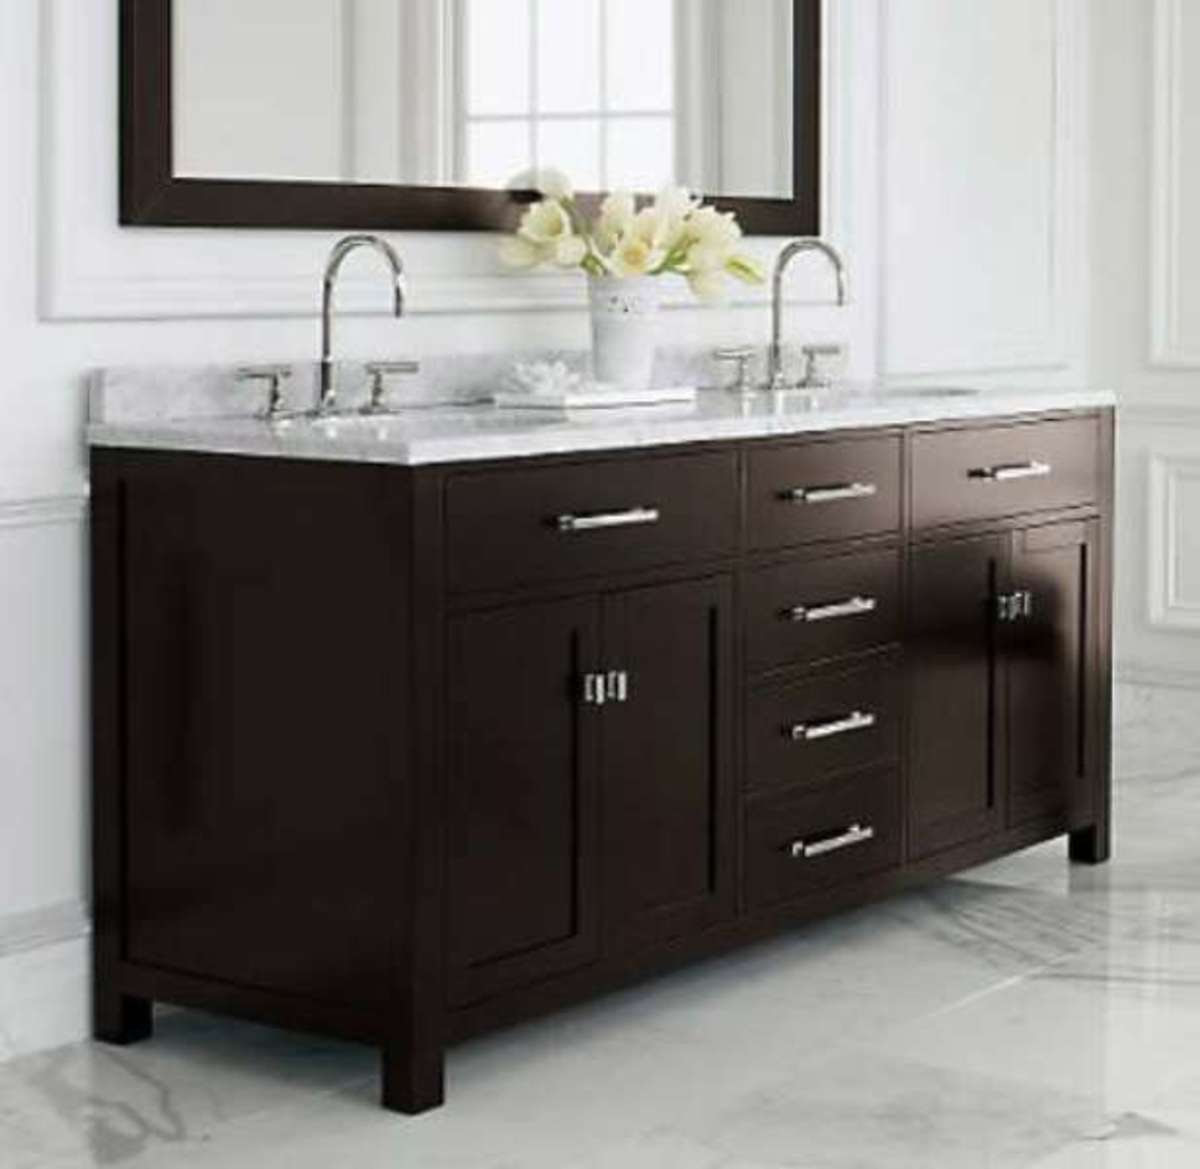 The Cheap Bathroom Vanity